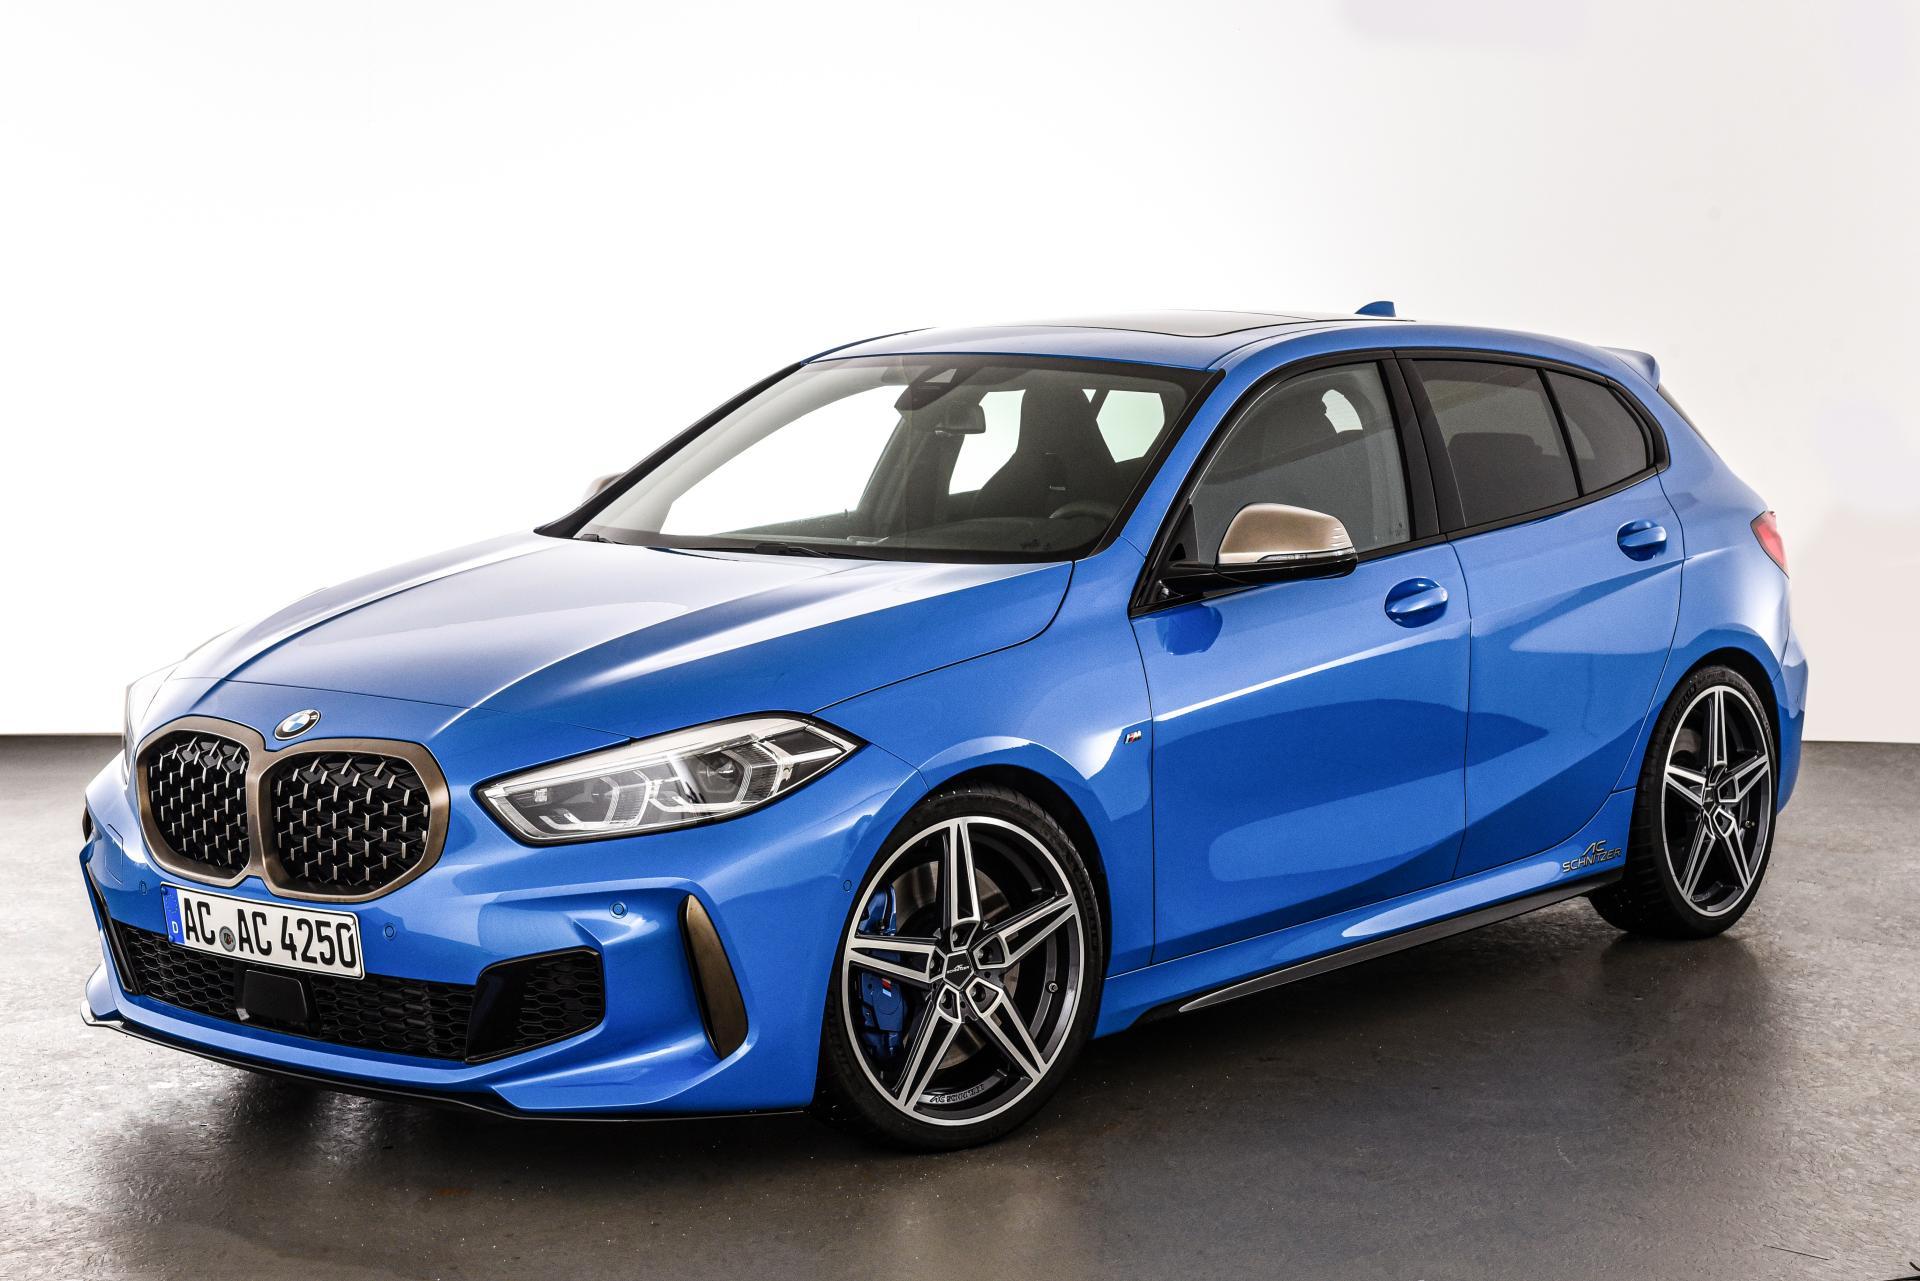 BMW-1-Series-M135i-by-AC-Schnitzer-4